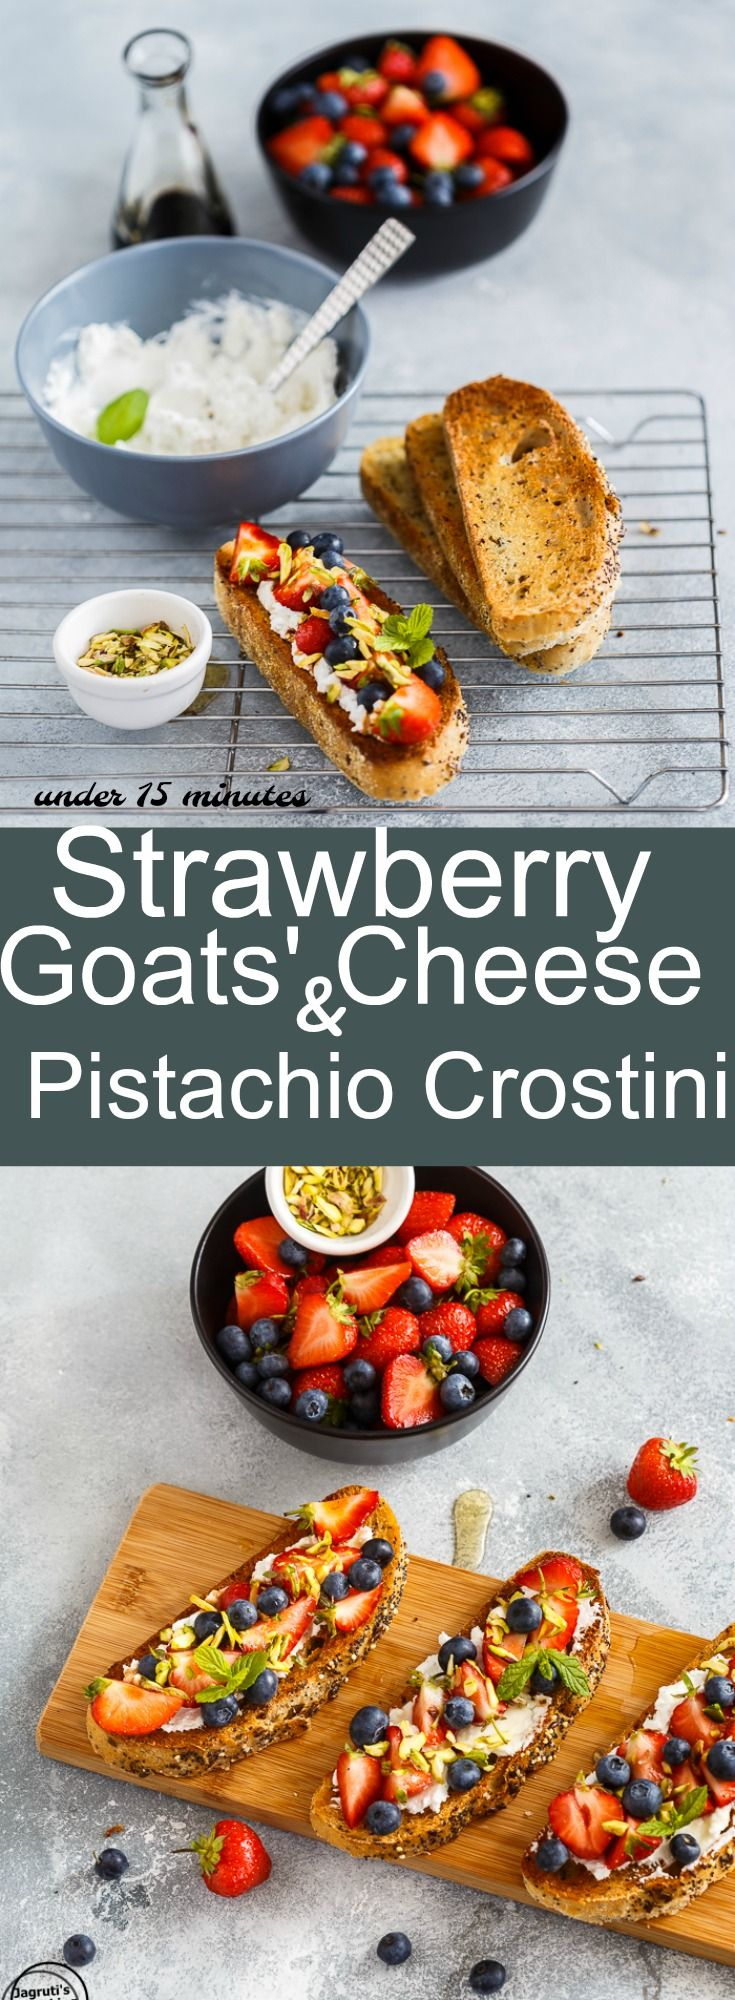 Strawberry, Goats' Cheese and Pistachio Crostini